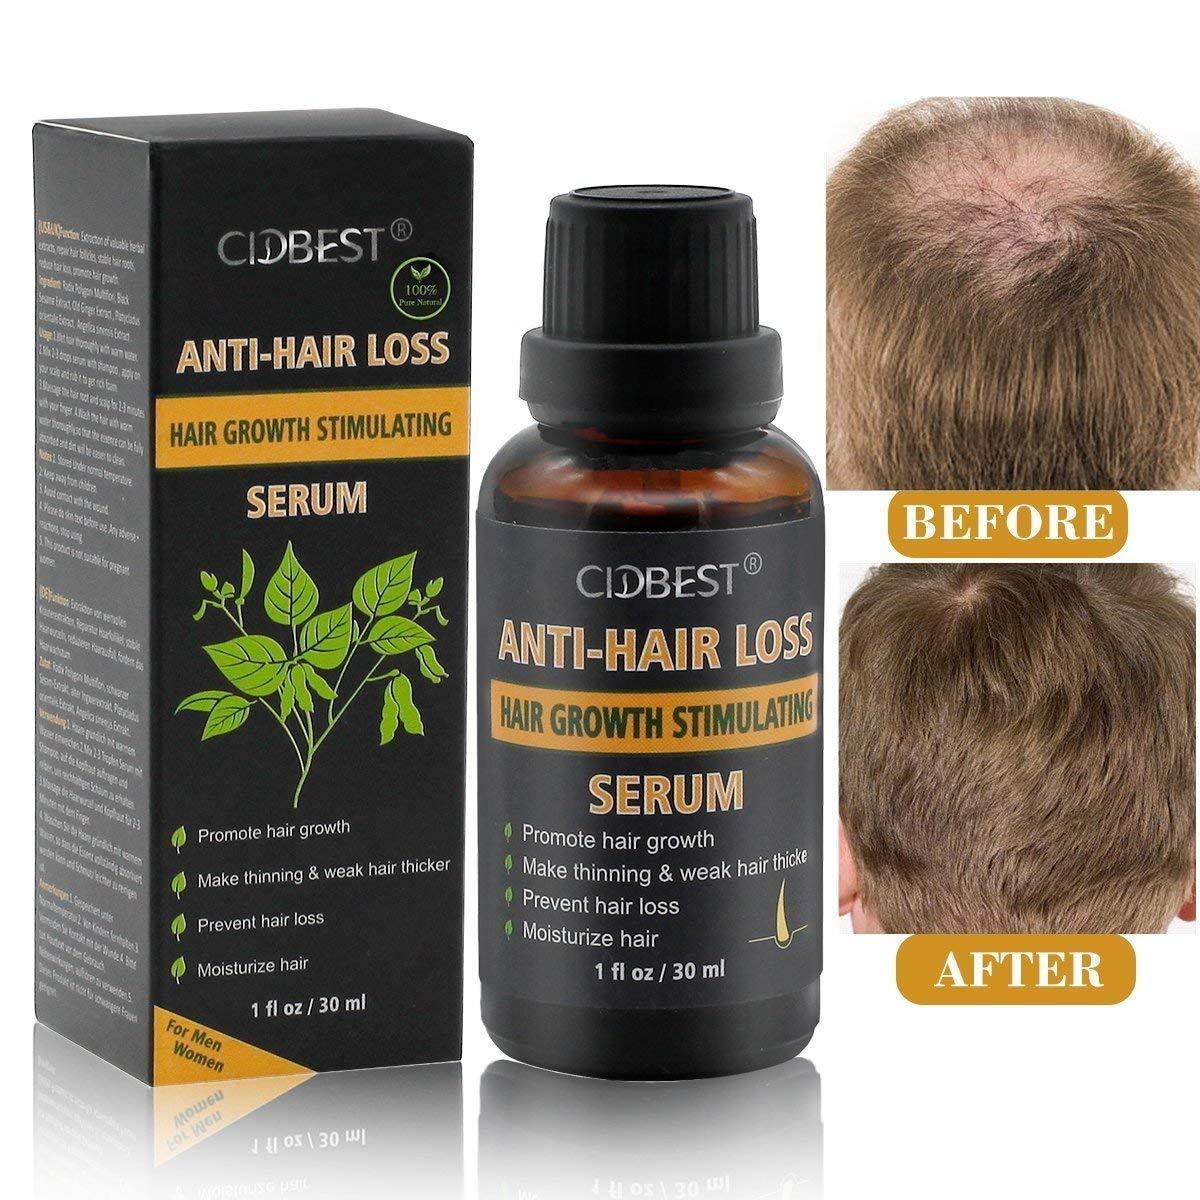 Anti Hair Loss Serum,Anti-Hair Loss Treatment,Natural Herbal Anti Hair Loss Hair Growth Serum-For Thinning Hair, Thickening & Regrowth Product, Fast Hair Growth Serum Support For Men & Women (30ML)